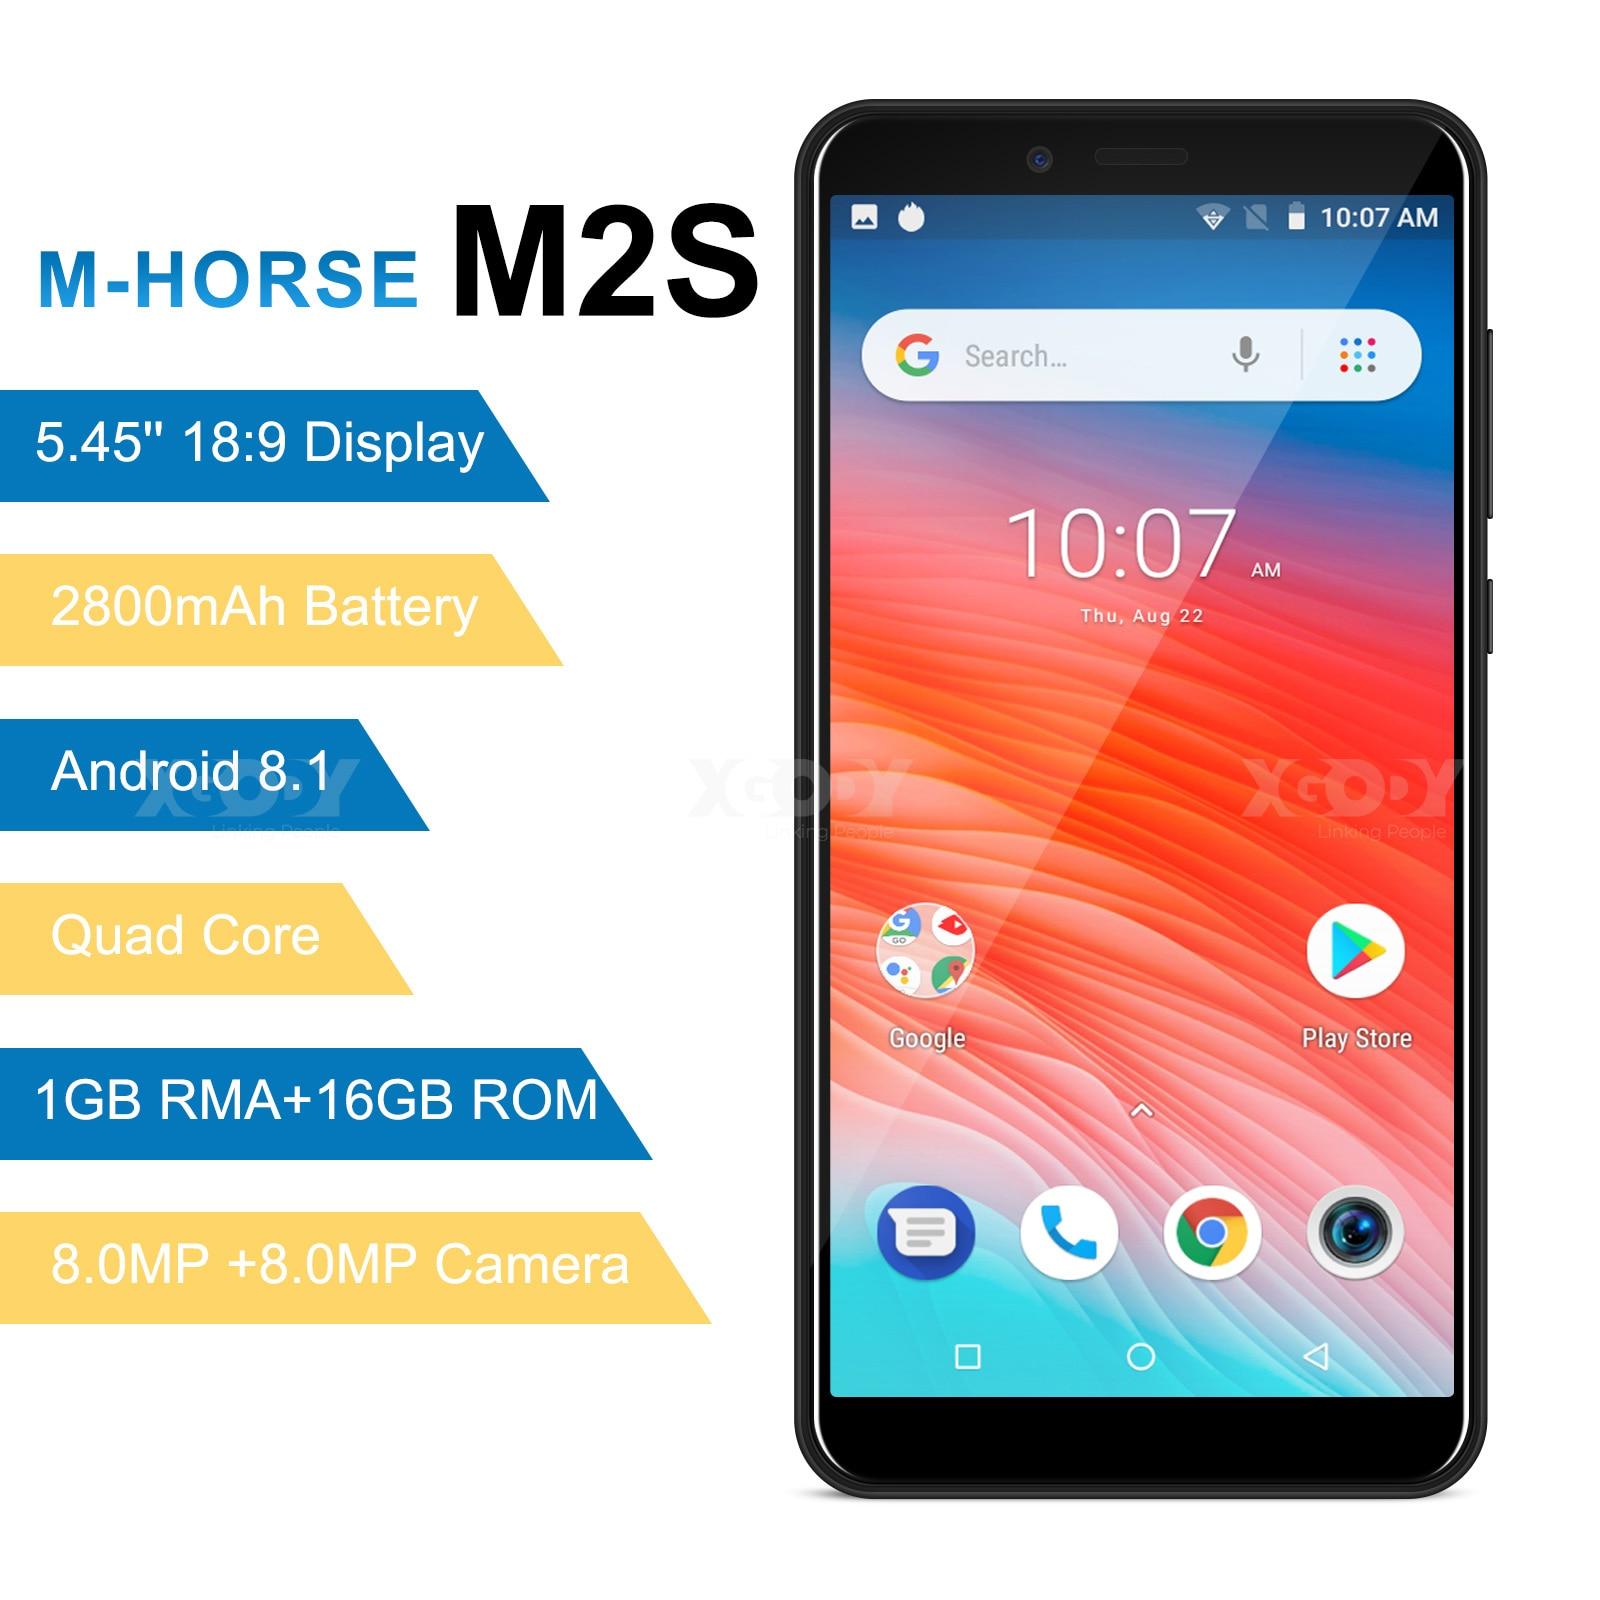 M-HORSE M2S Smartphone Quad Core Android 8.1 2800mAh Cellphone 1GB+16GB 5.45 Inch 18:9 Screen Dual Camera 3G Mobile Phone